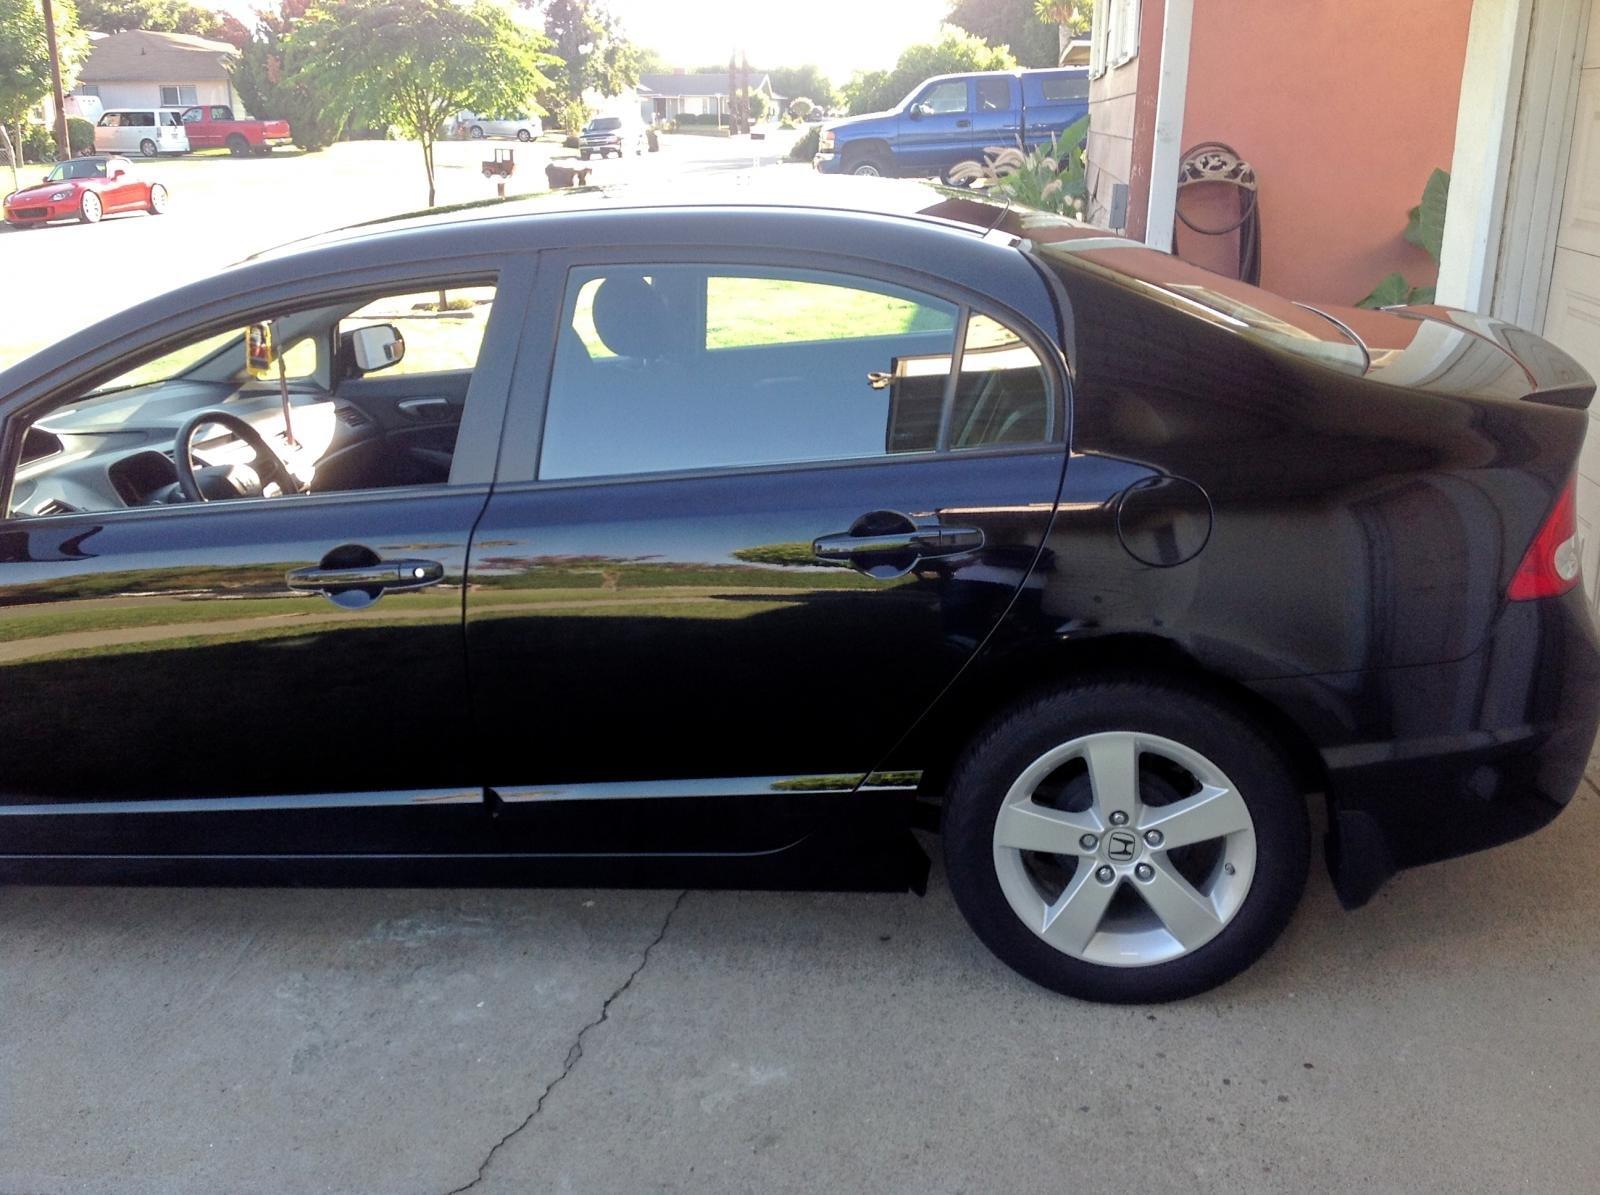 ... 2011 Civic LX S Civic 20111